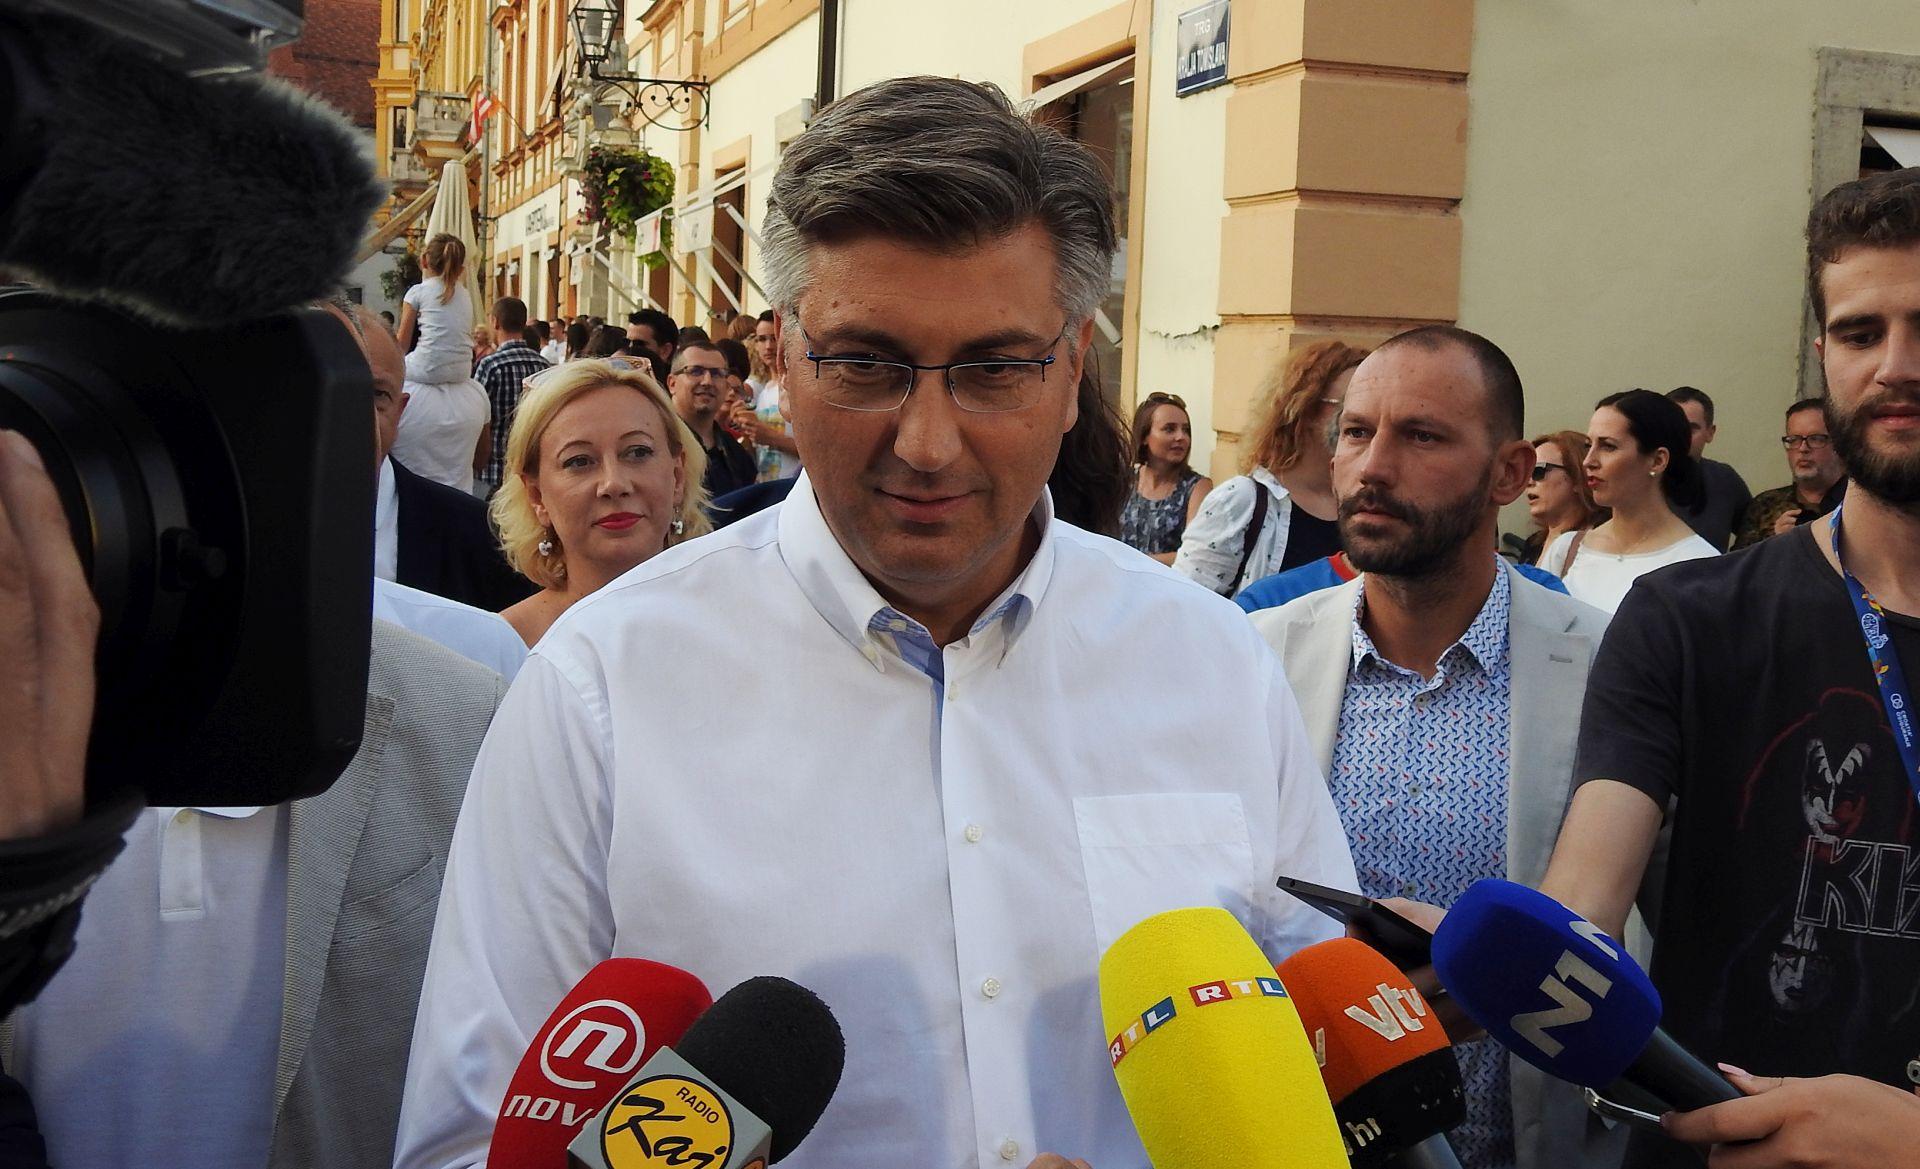 Sindikati Uljanika pisali premijeru Plenkoviću